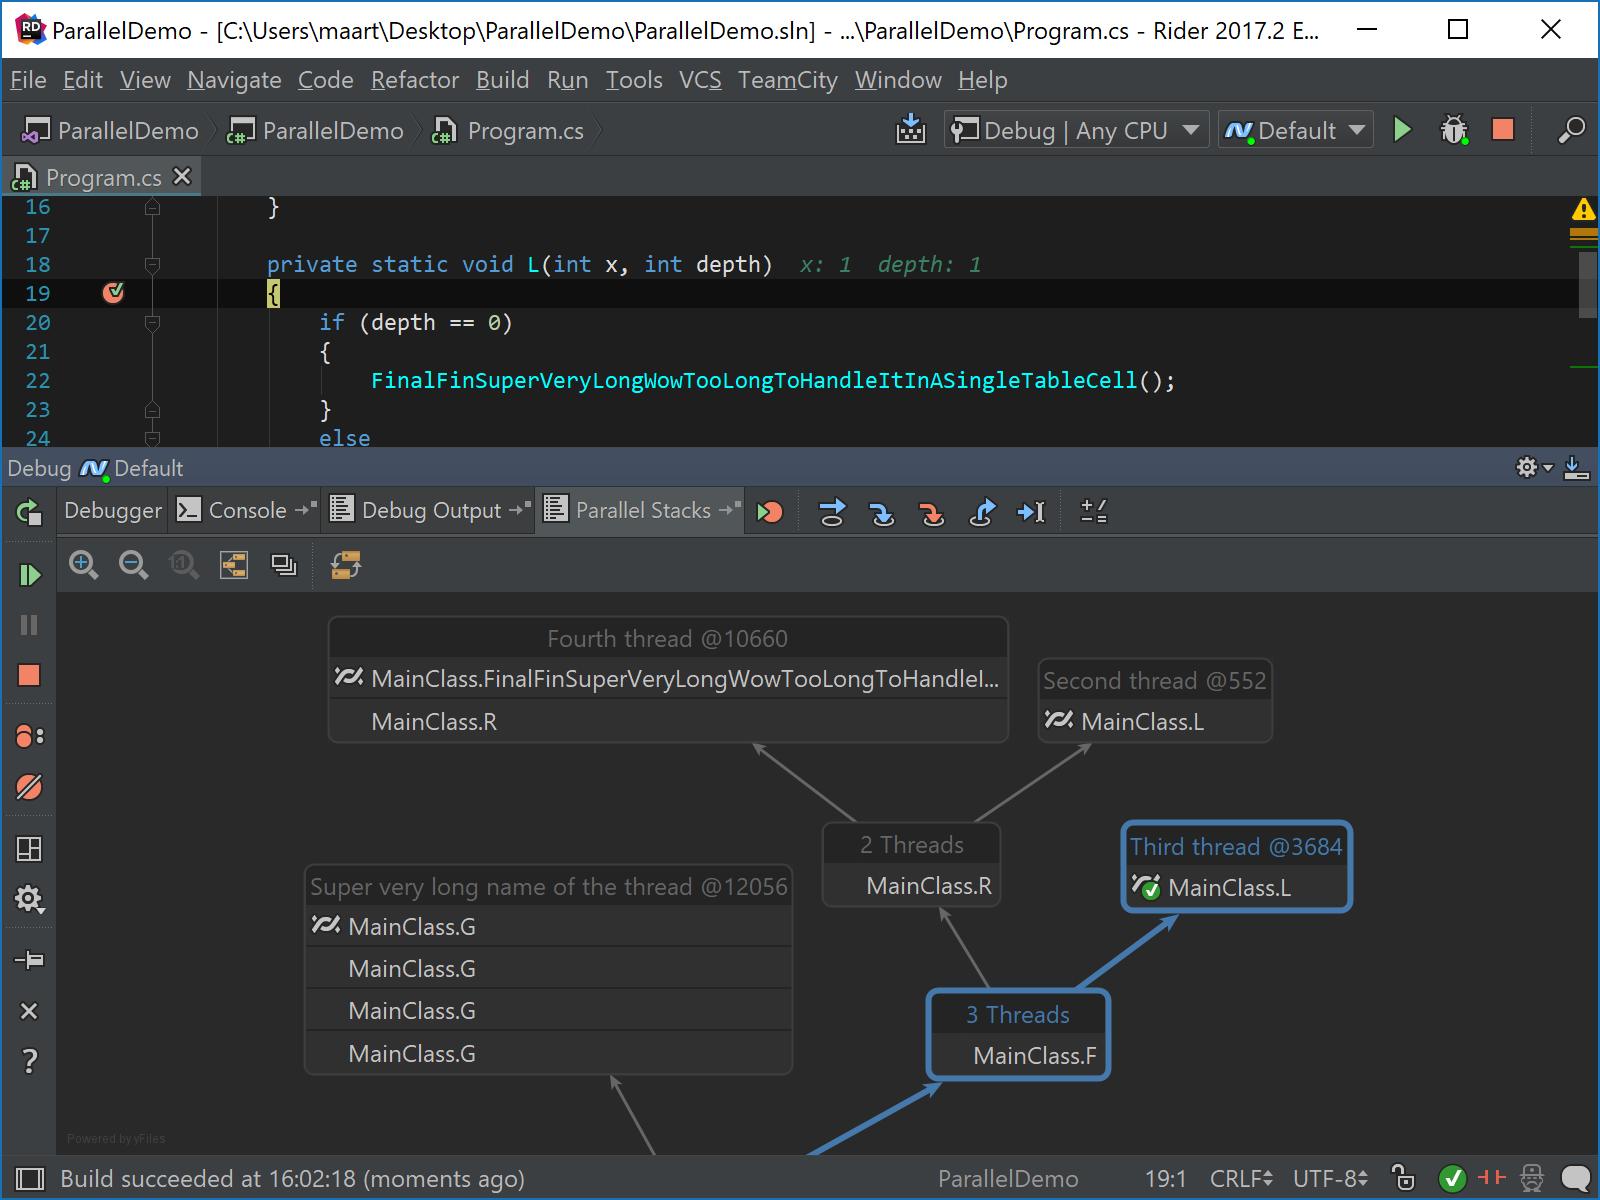 Parallel Stacks debugging in action